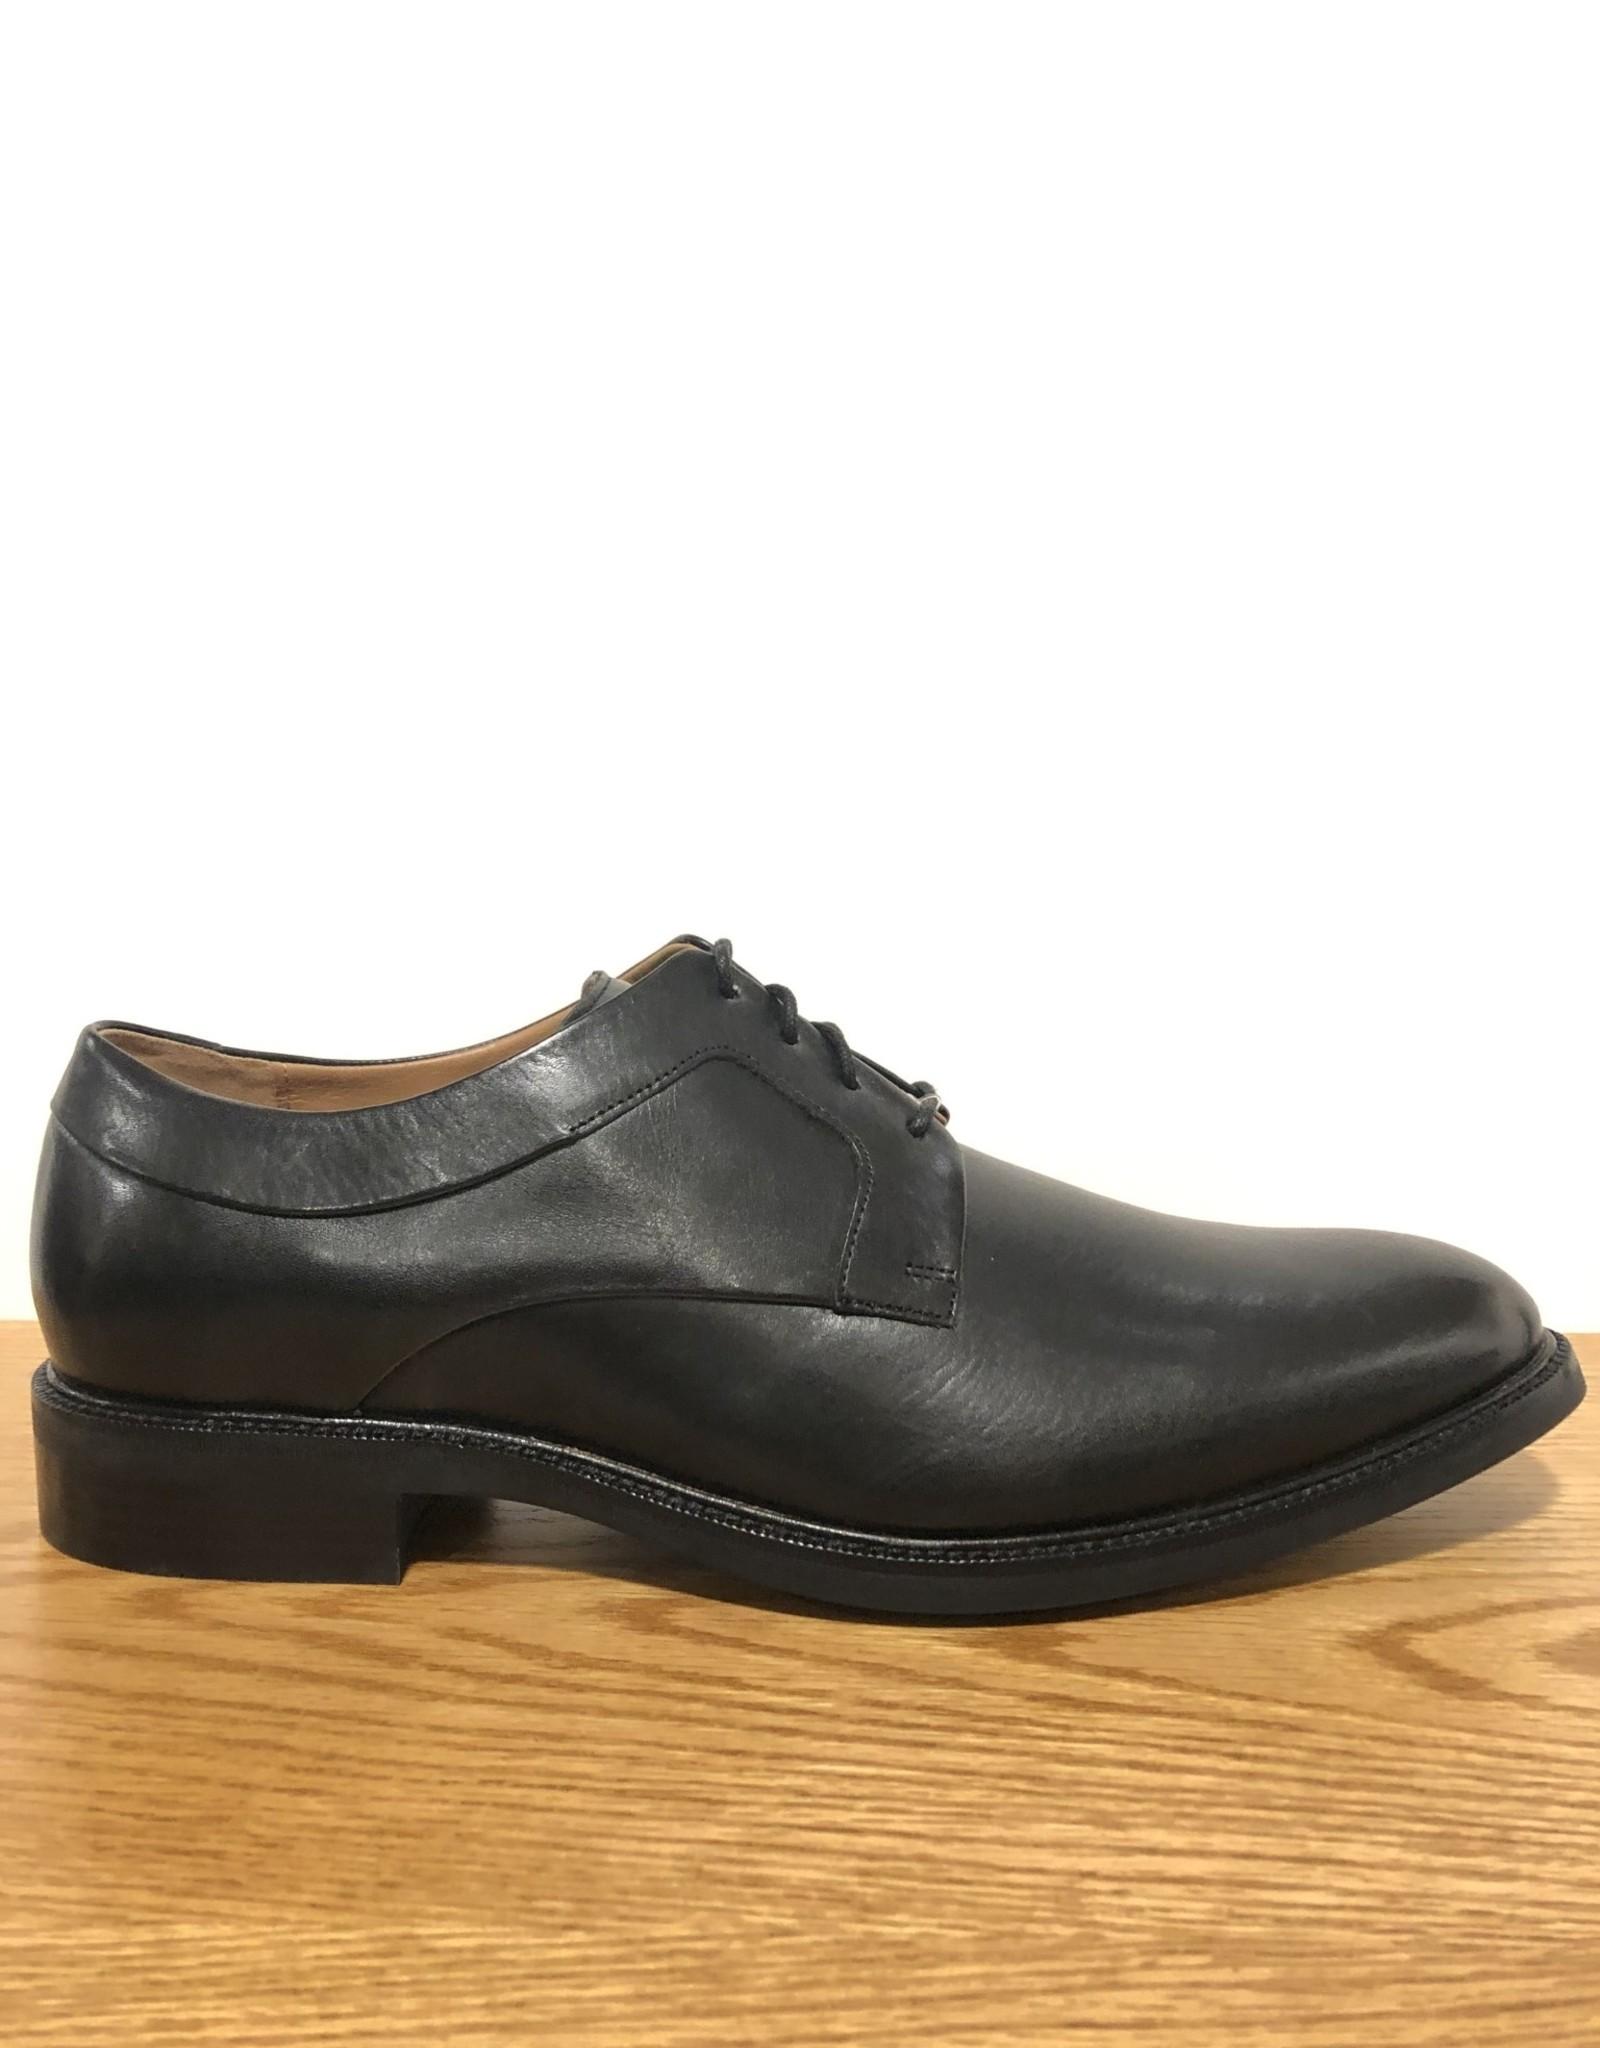 COLE HAAN C20324W Black Warren Plain Reg $295